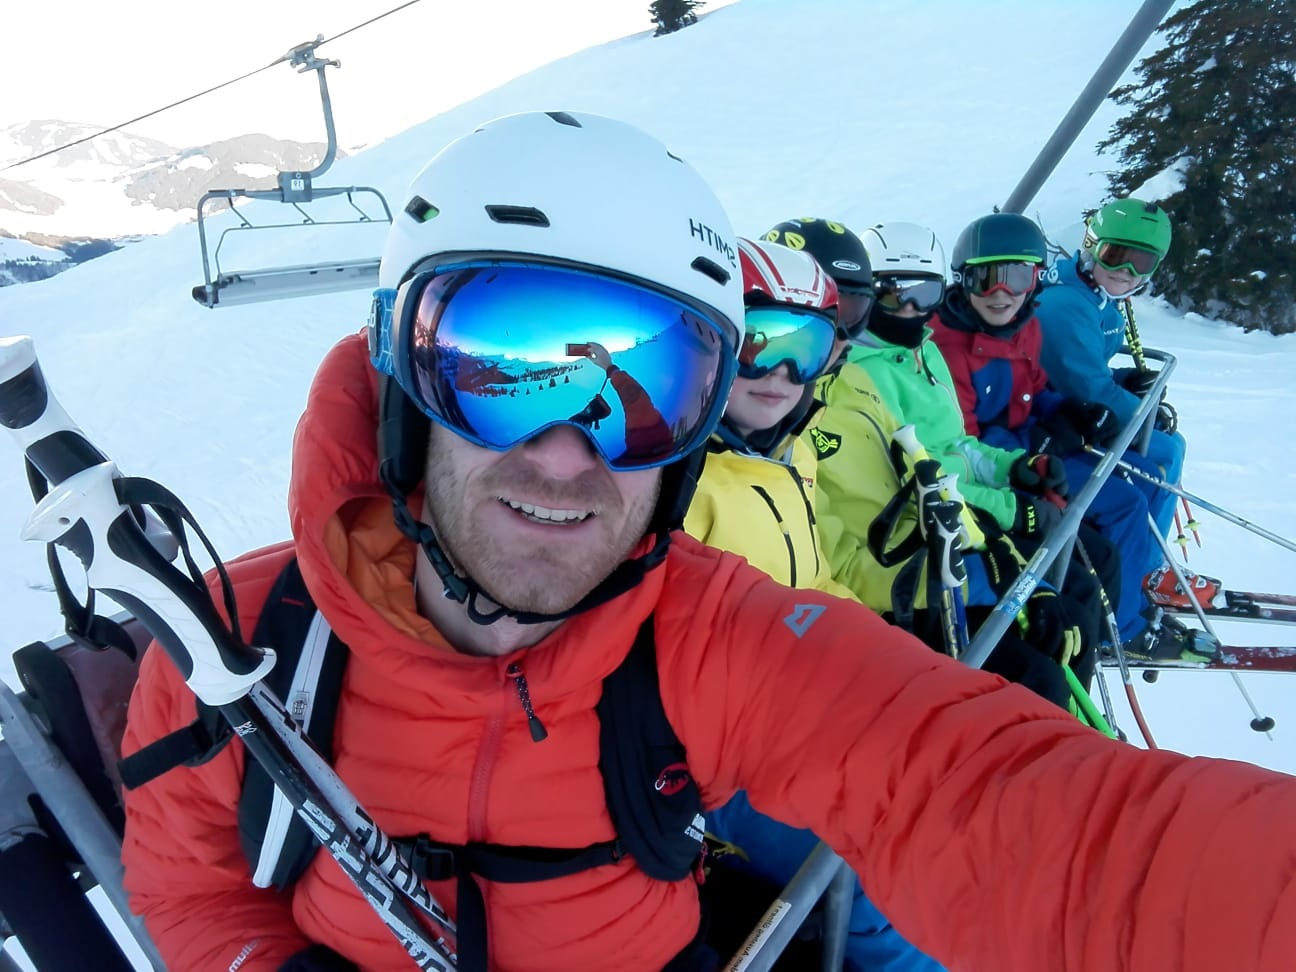 Exklusiv: Reisetagebuch aus dem erstem Skilager 2019!